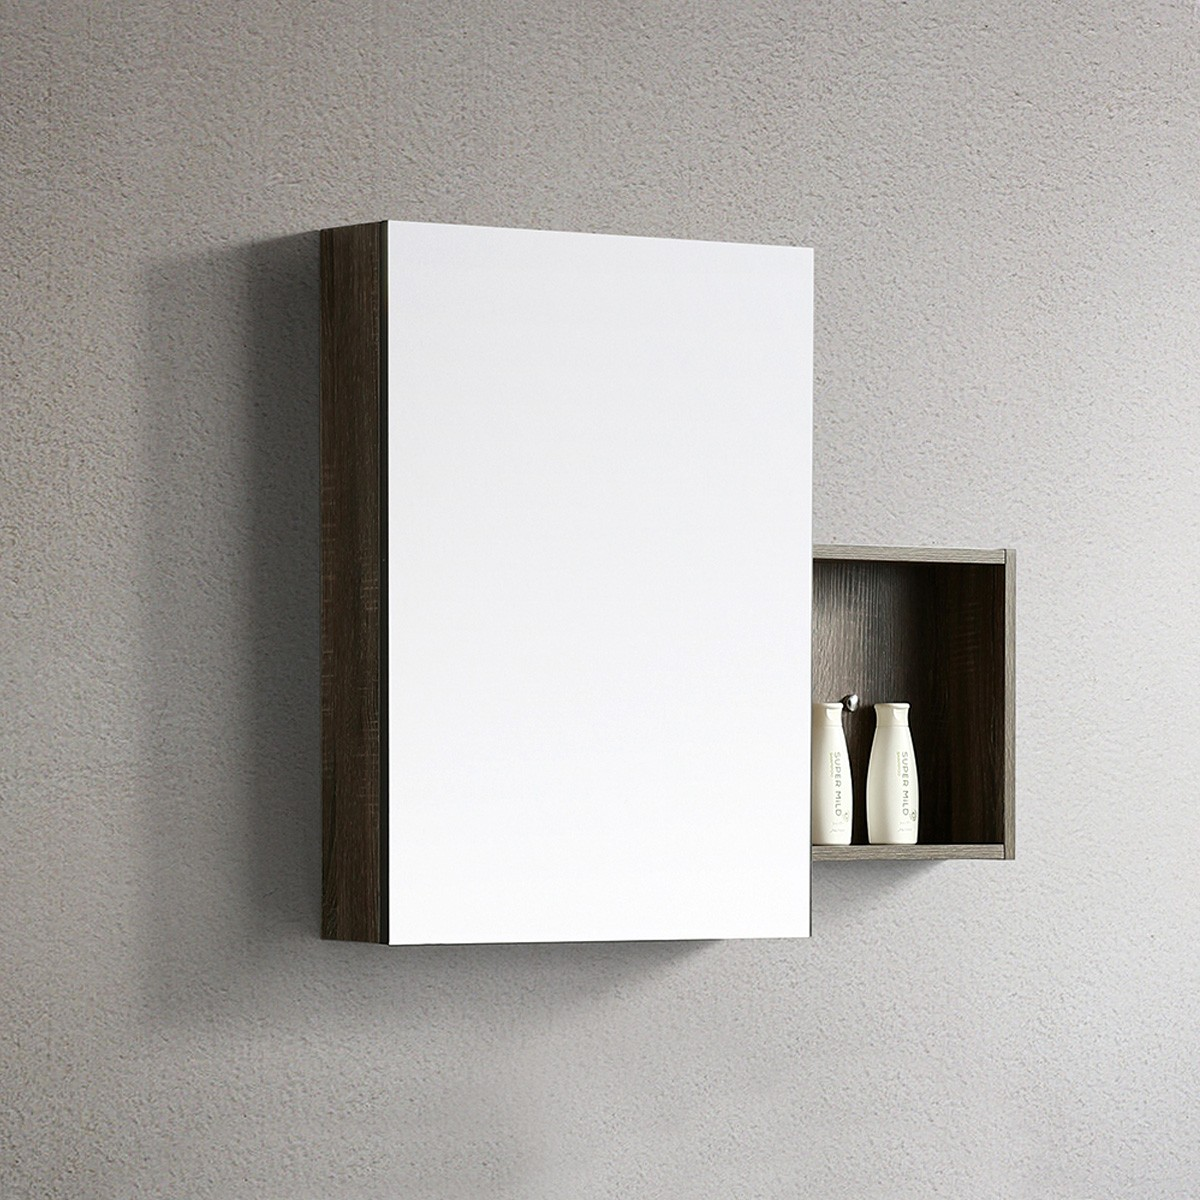 34 x 30 In. Mirror Cabinet with Mirror Door and shelf (G8295-M)